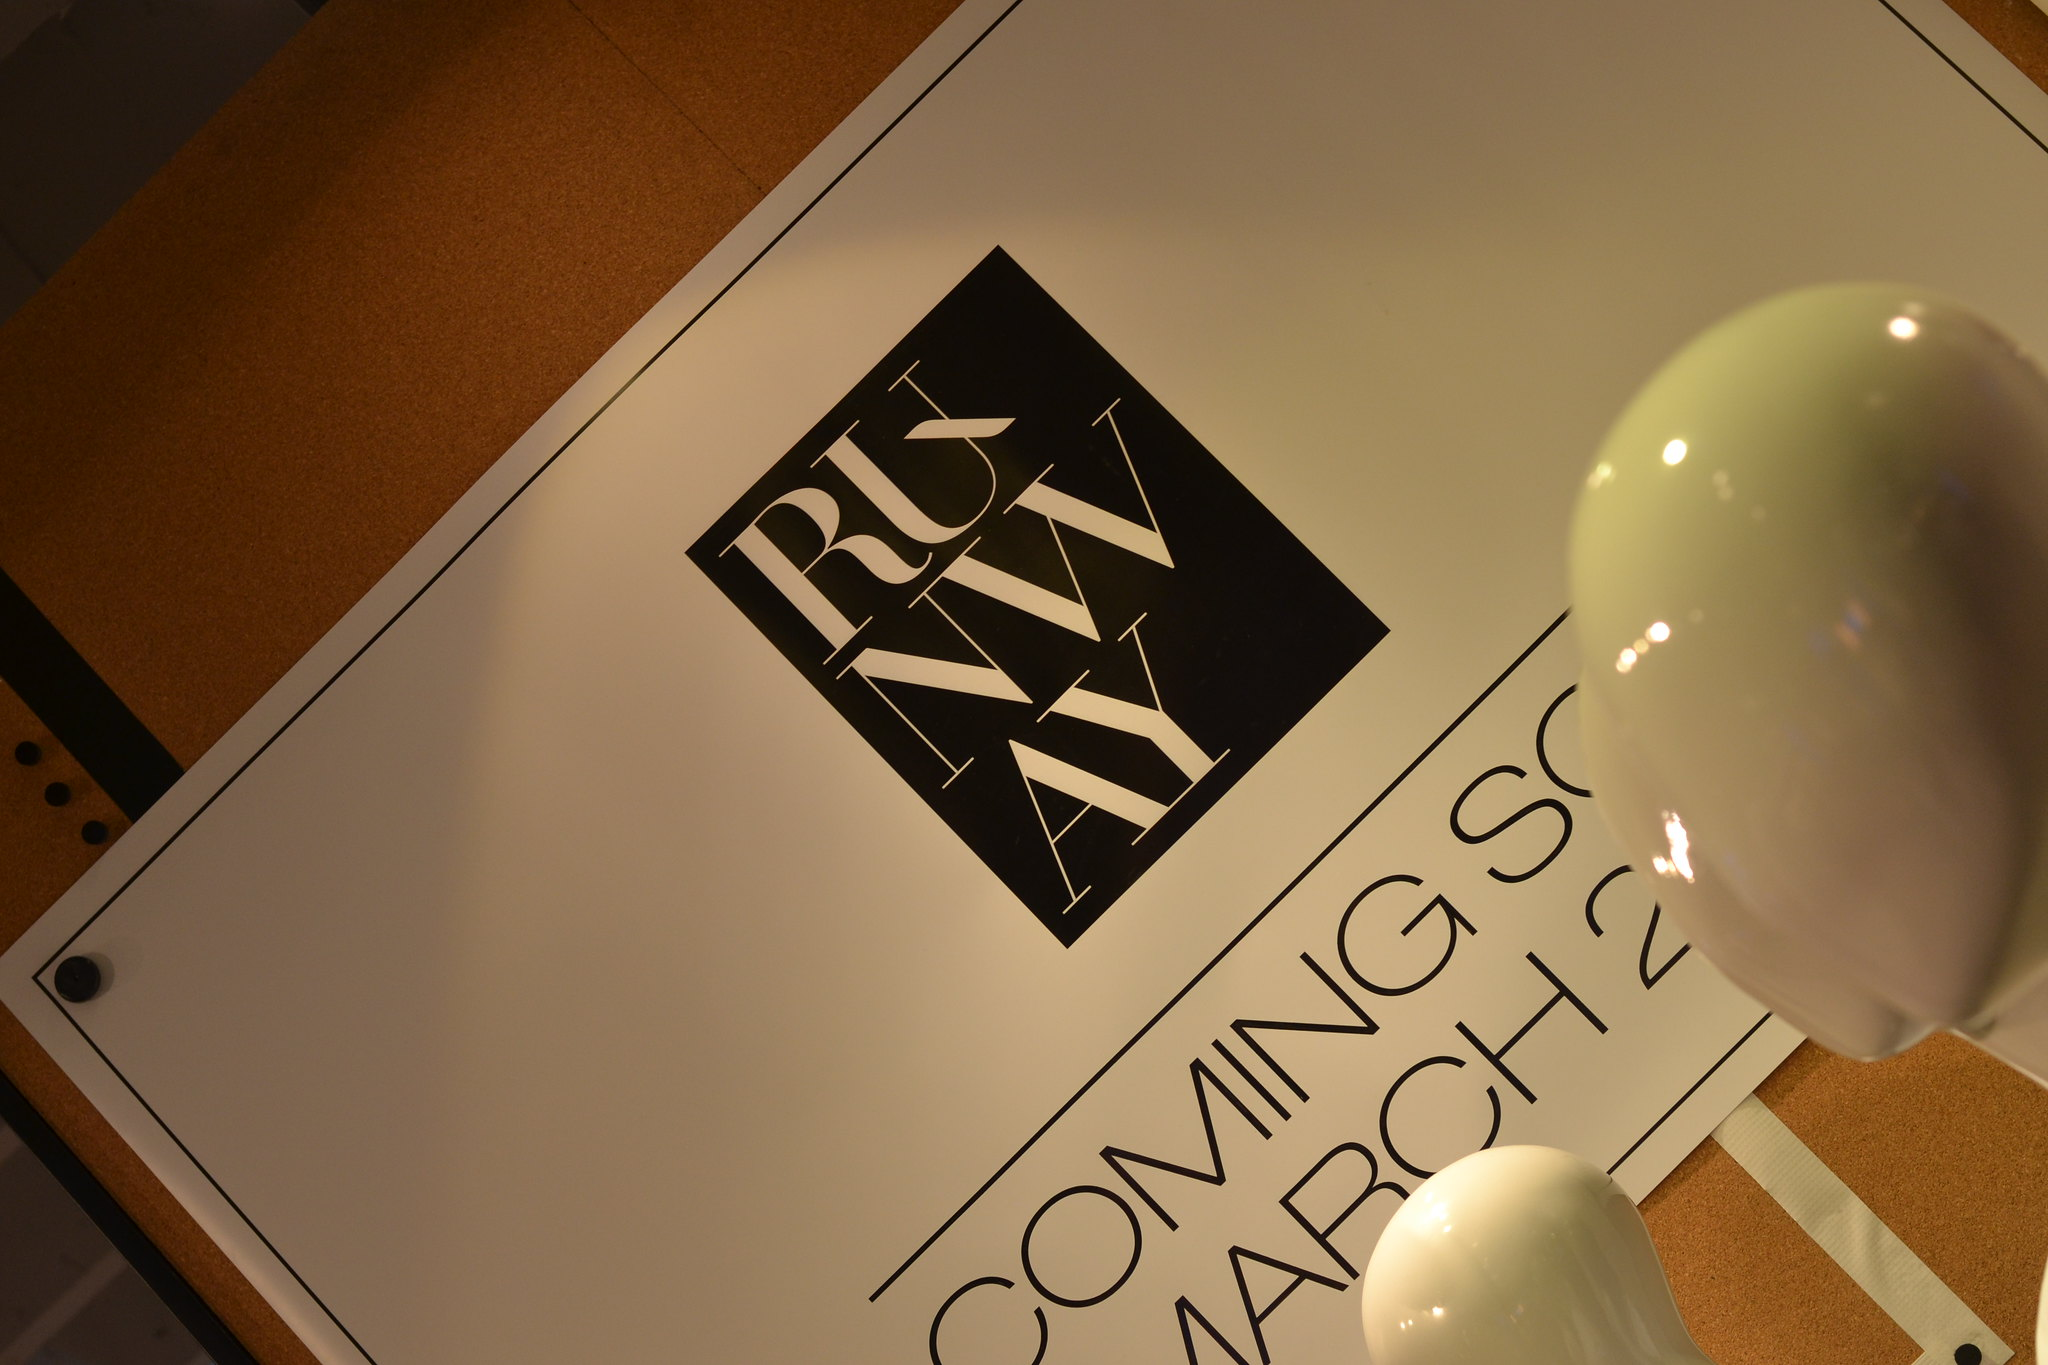 Renuar New Store Opening Dizengof Center